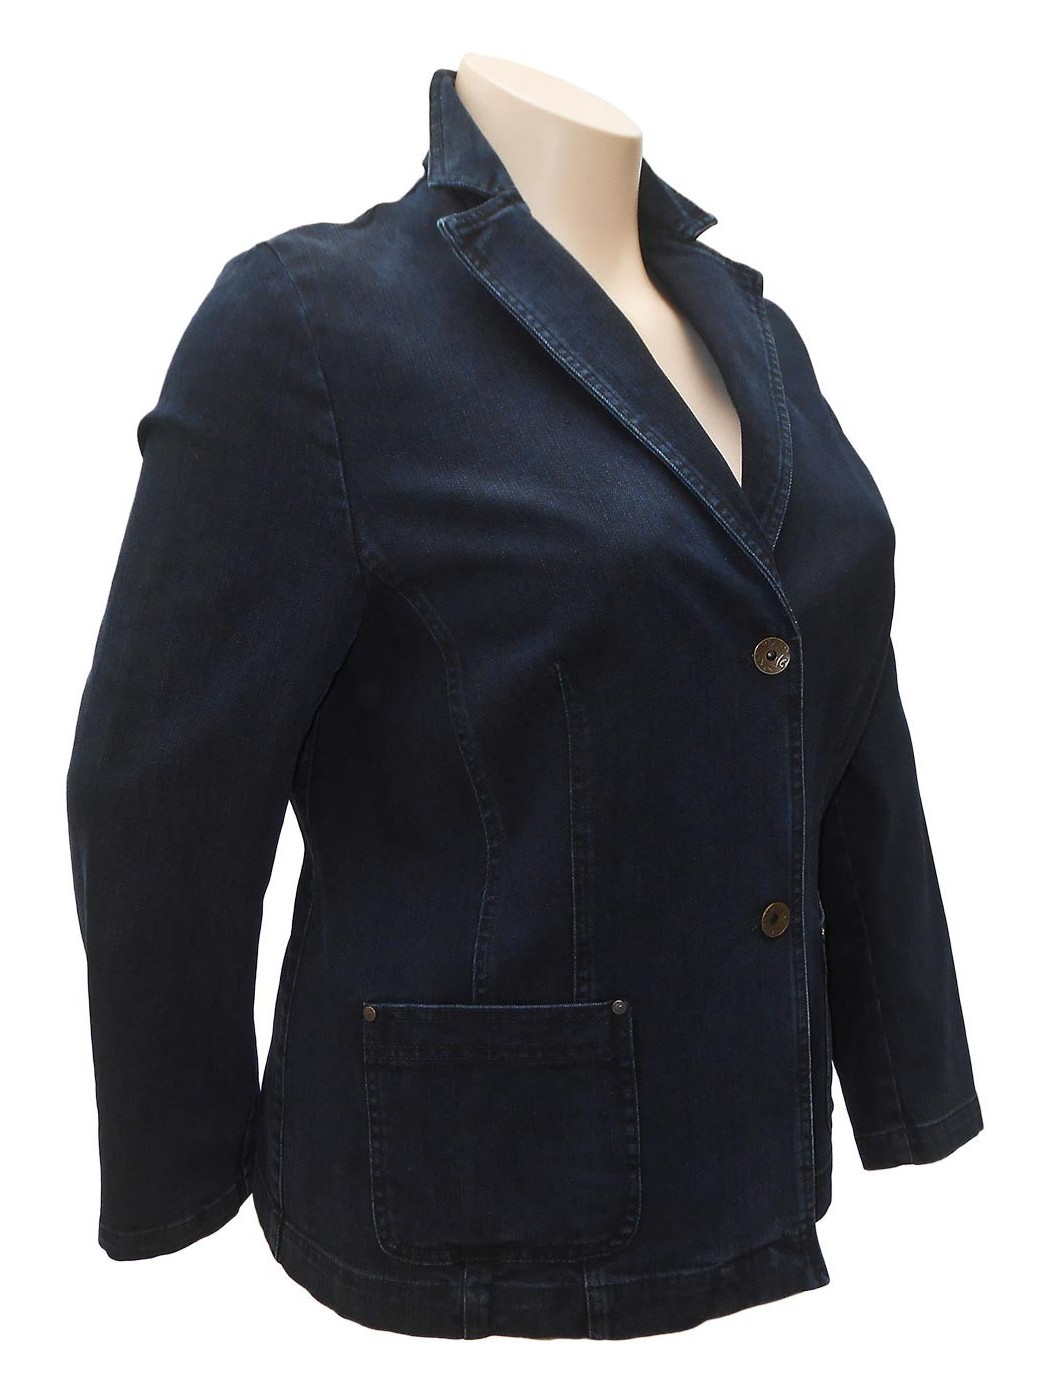 Atian jeans jacket